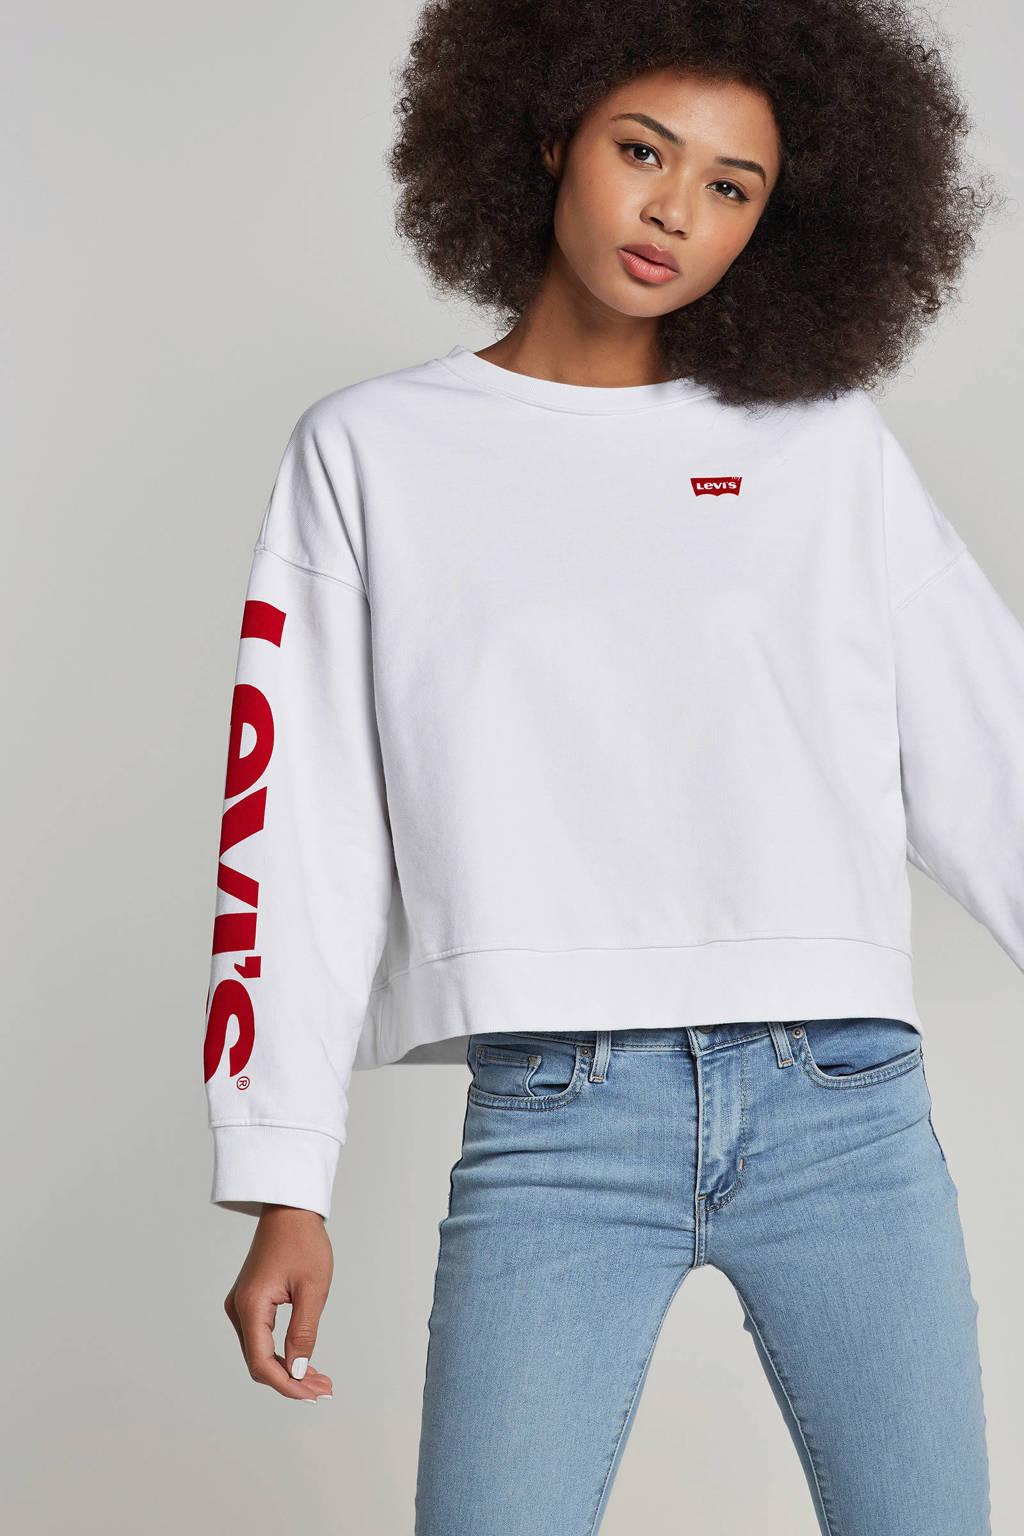 Levi's sweater, Wit